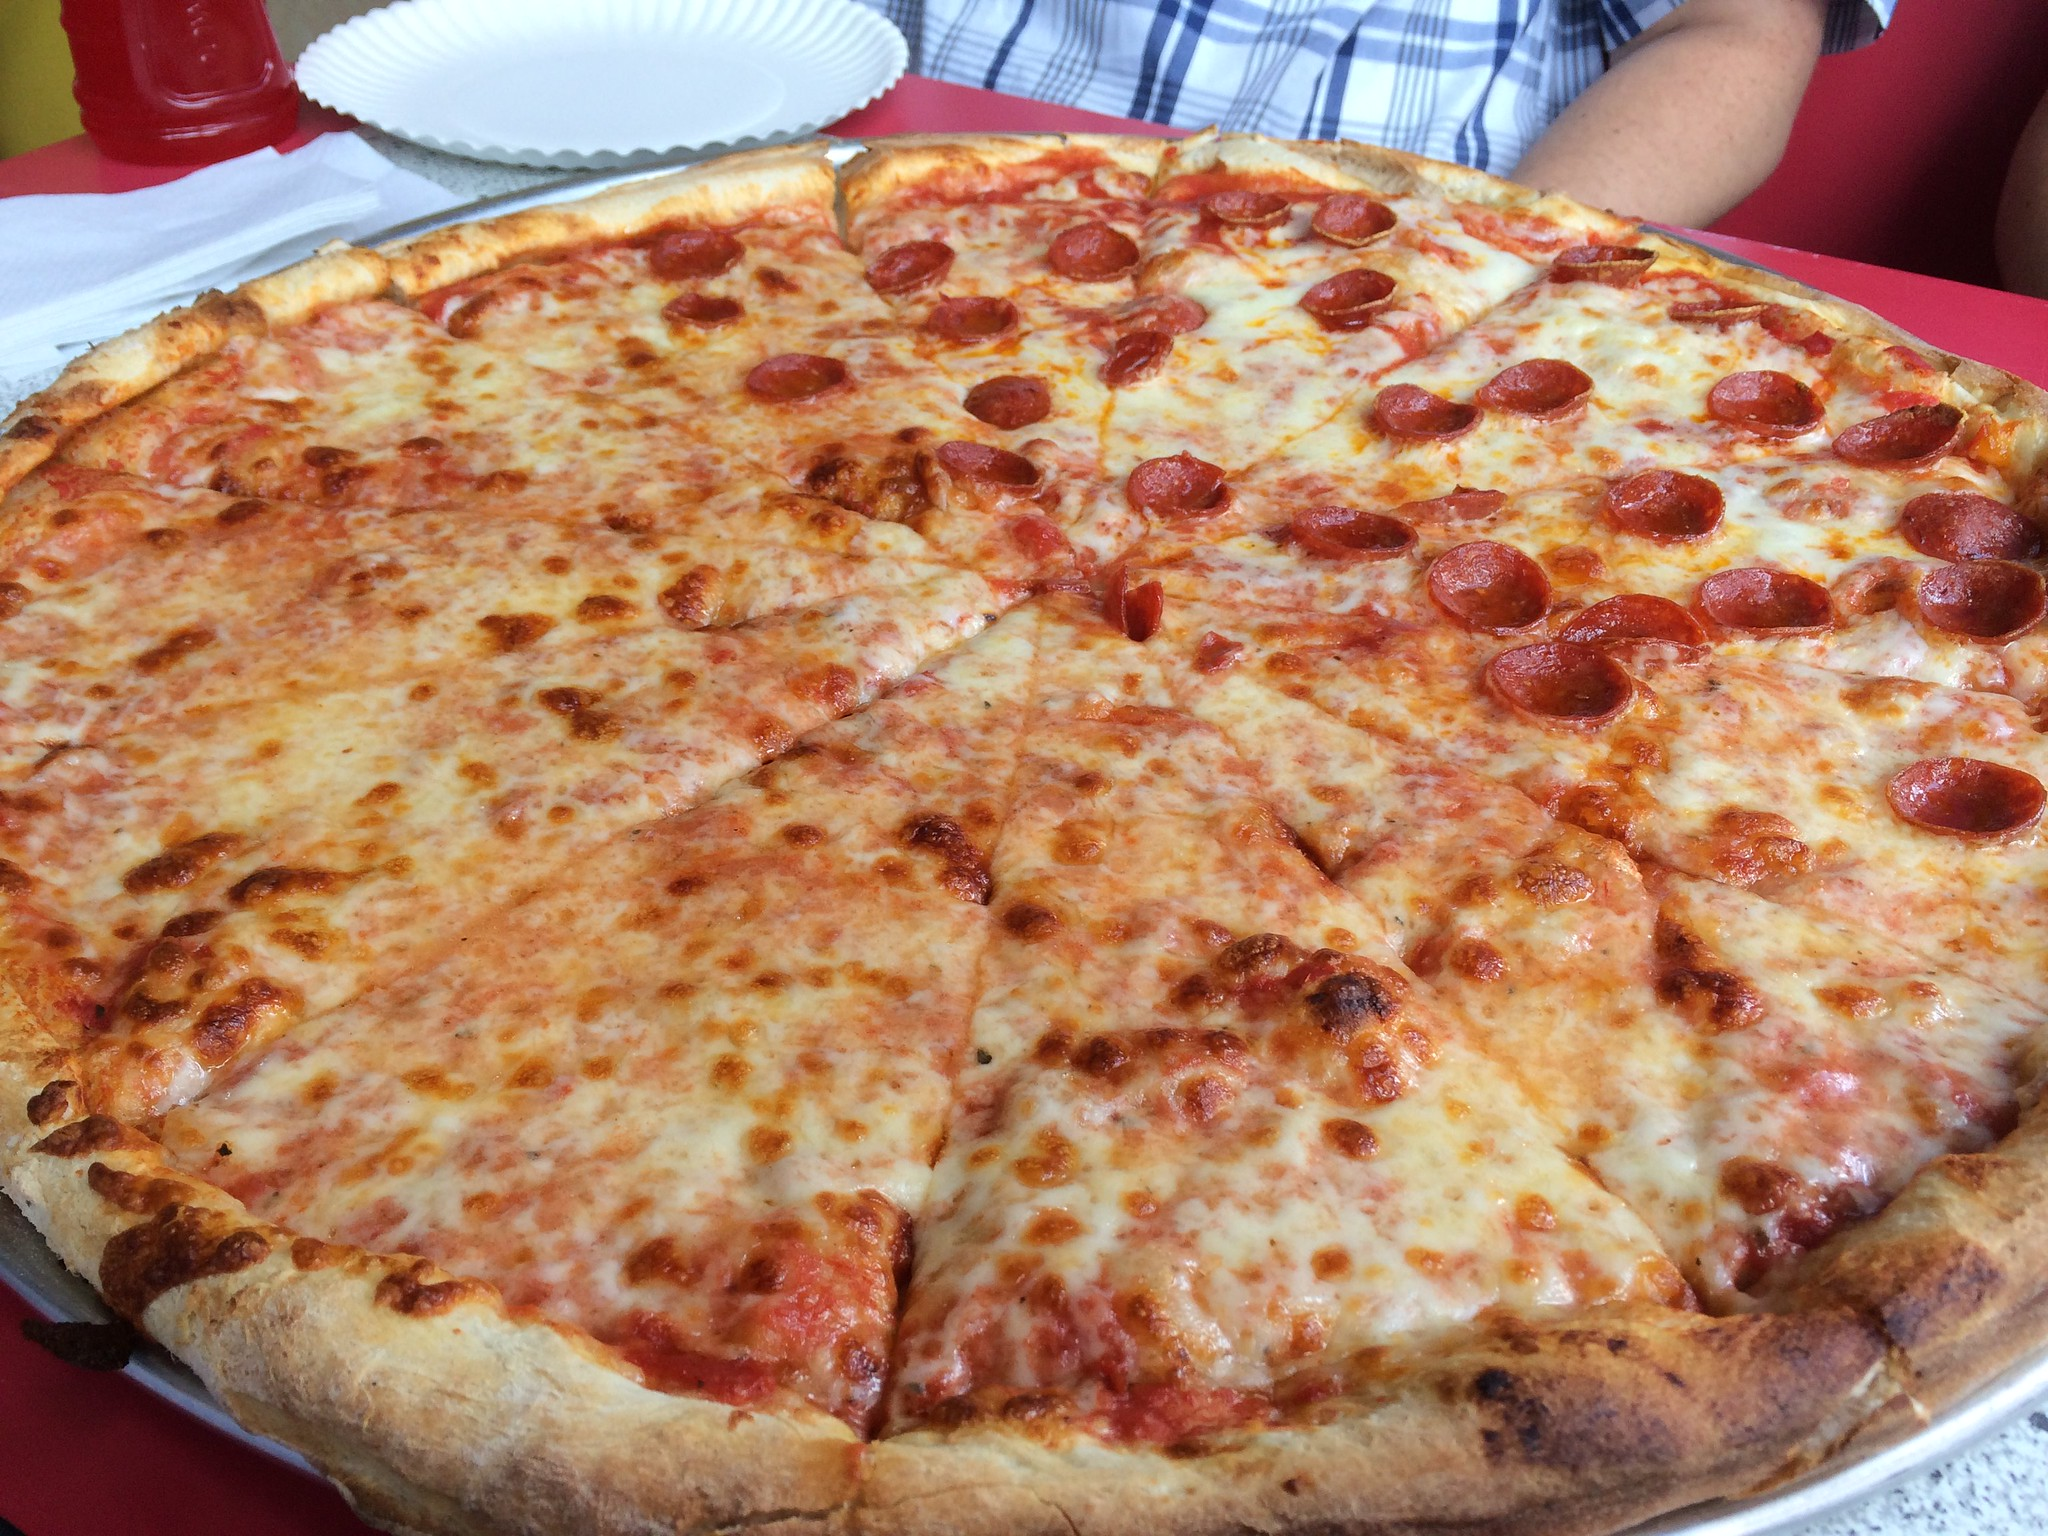 Pizza Al's 4